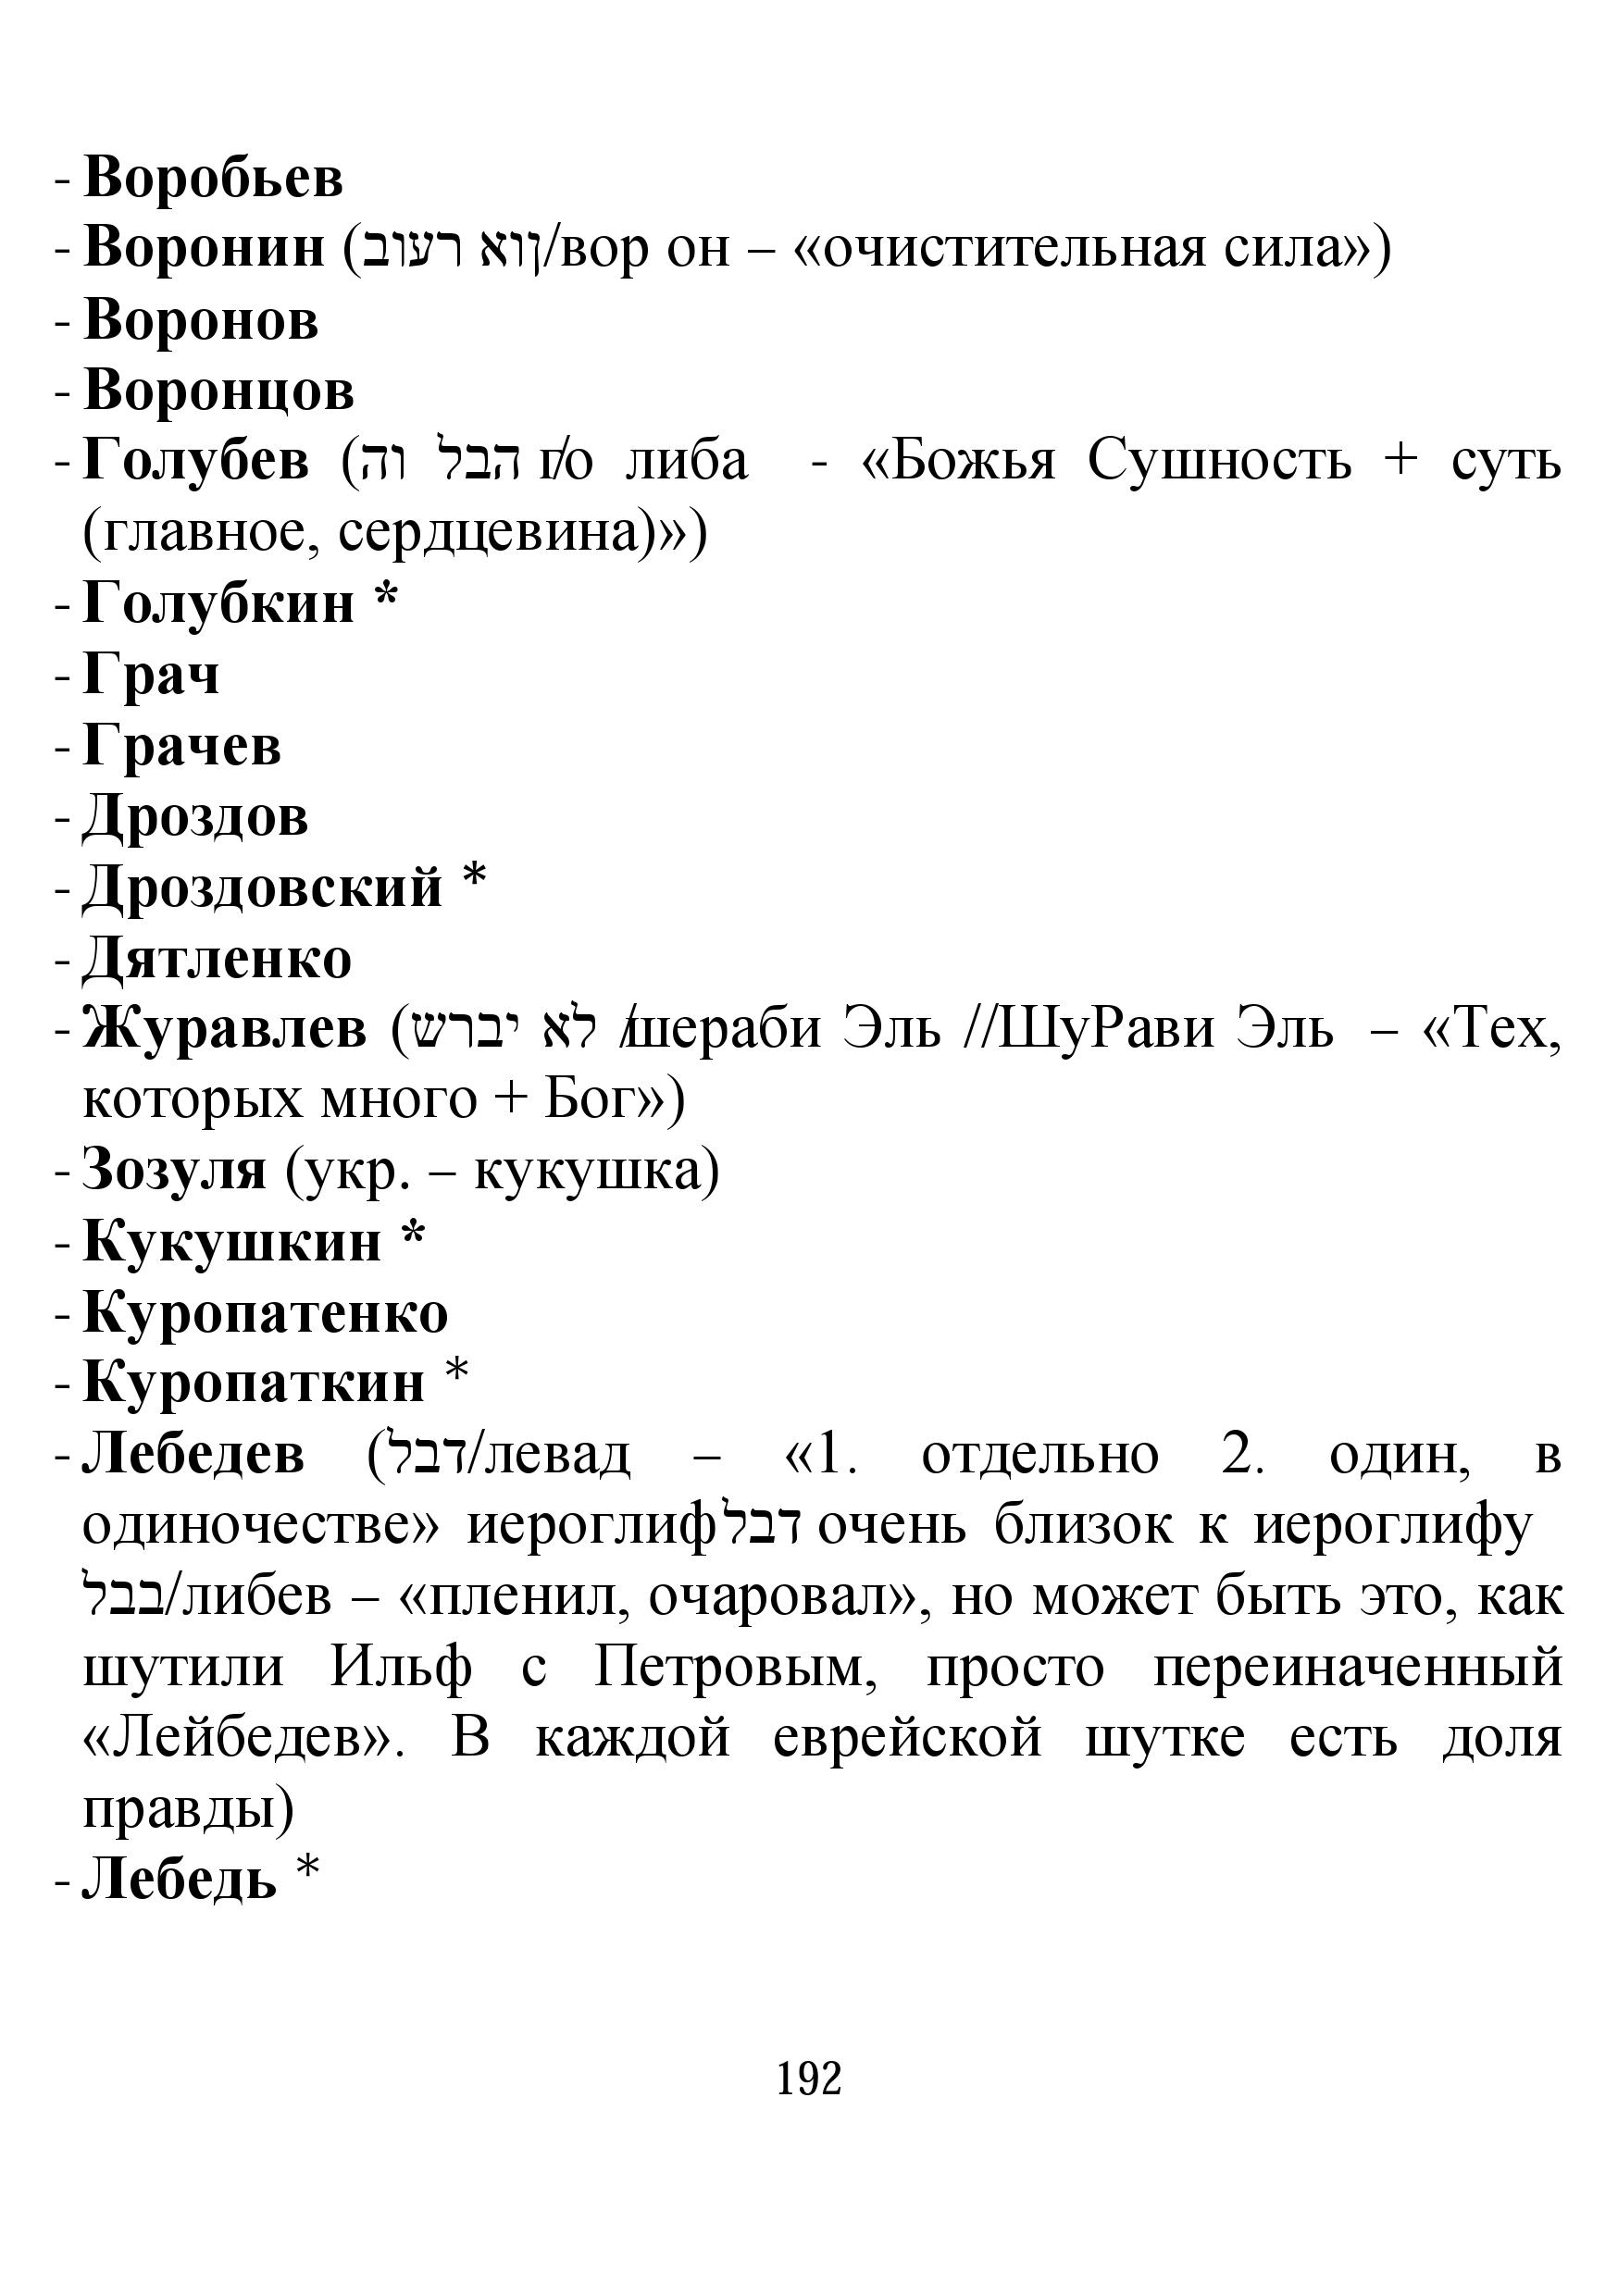 http://s1.uploads.ru/uTIRy.jpg